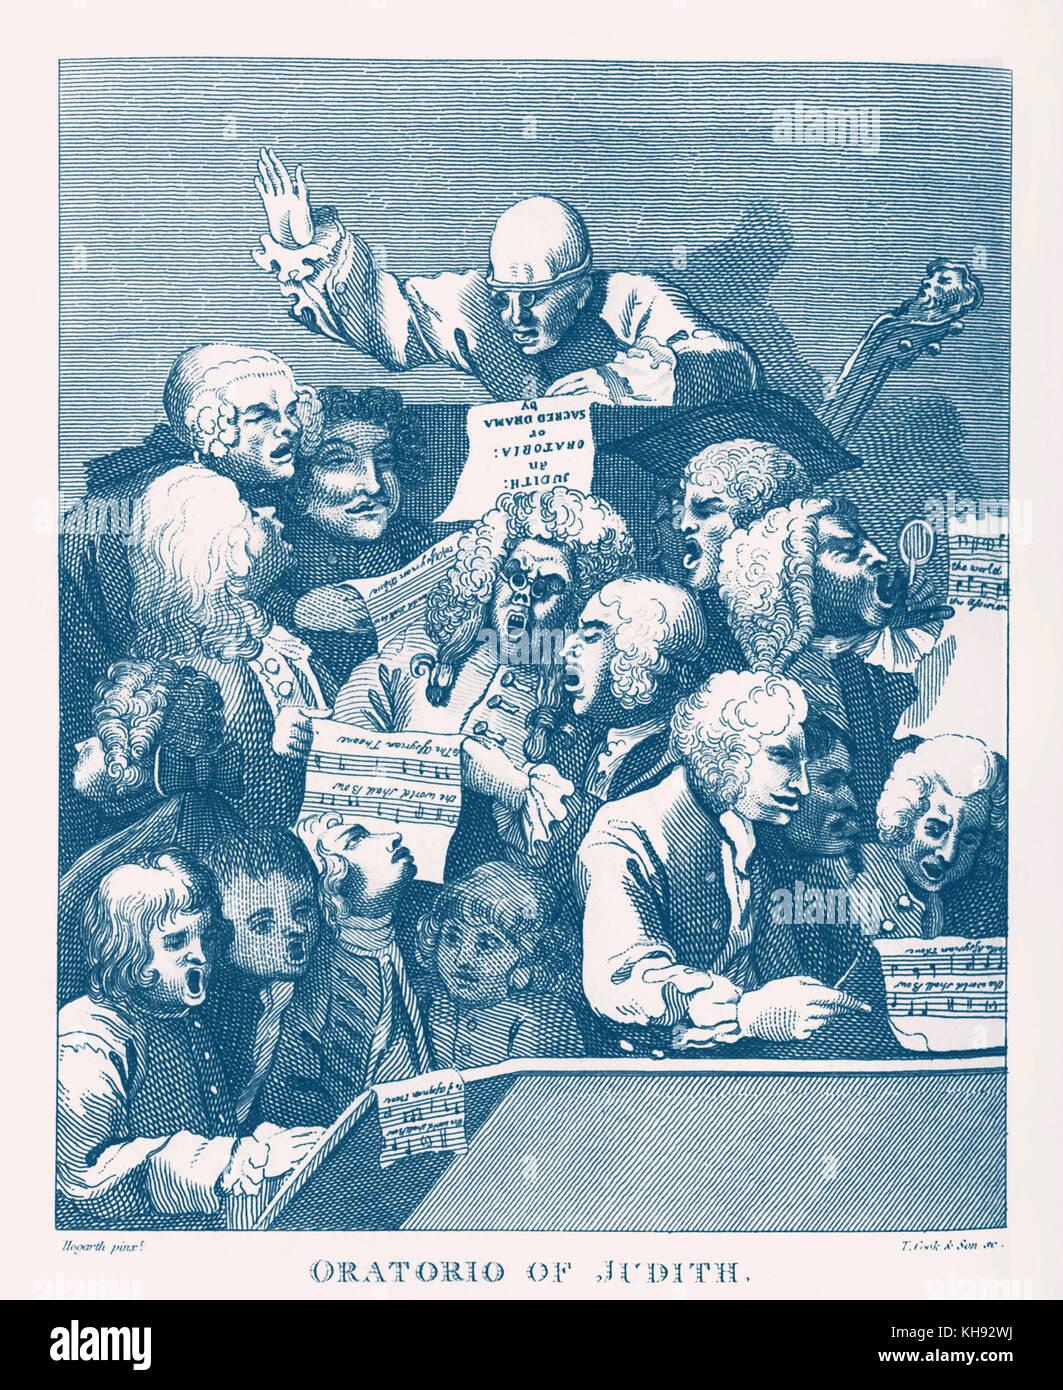 Handel's Choir / the Chorus  - in sketch by Hogarth, 1731. Singing Willem de Fesch's Oratorio, 'Judith'. - Stock Image